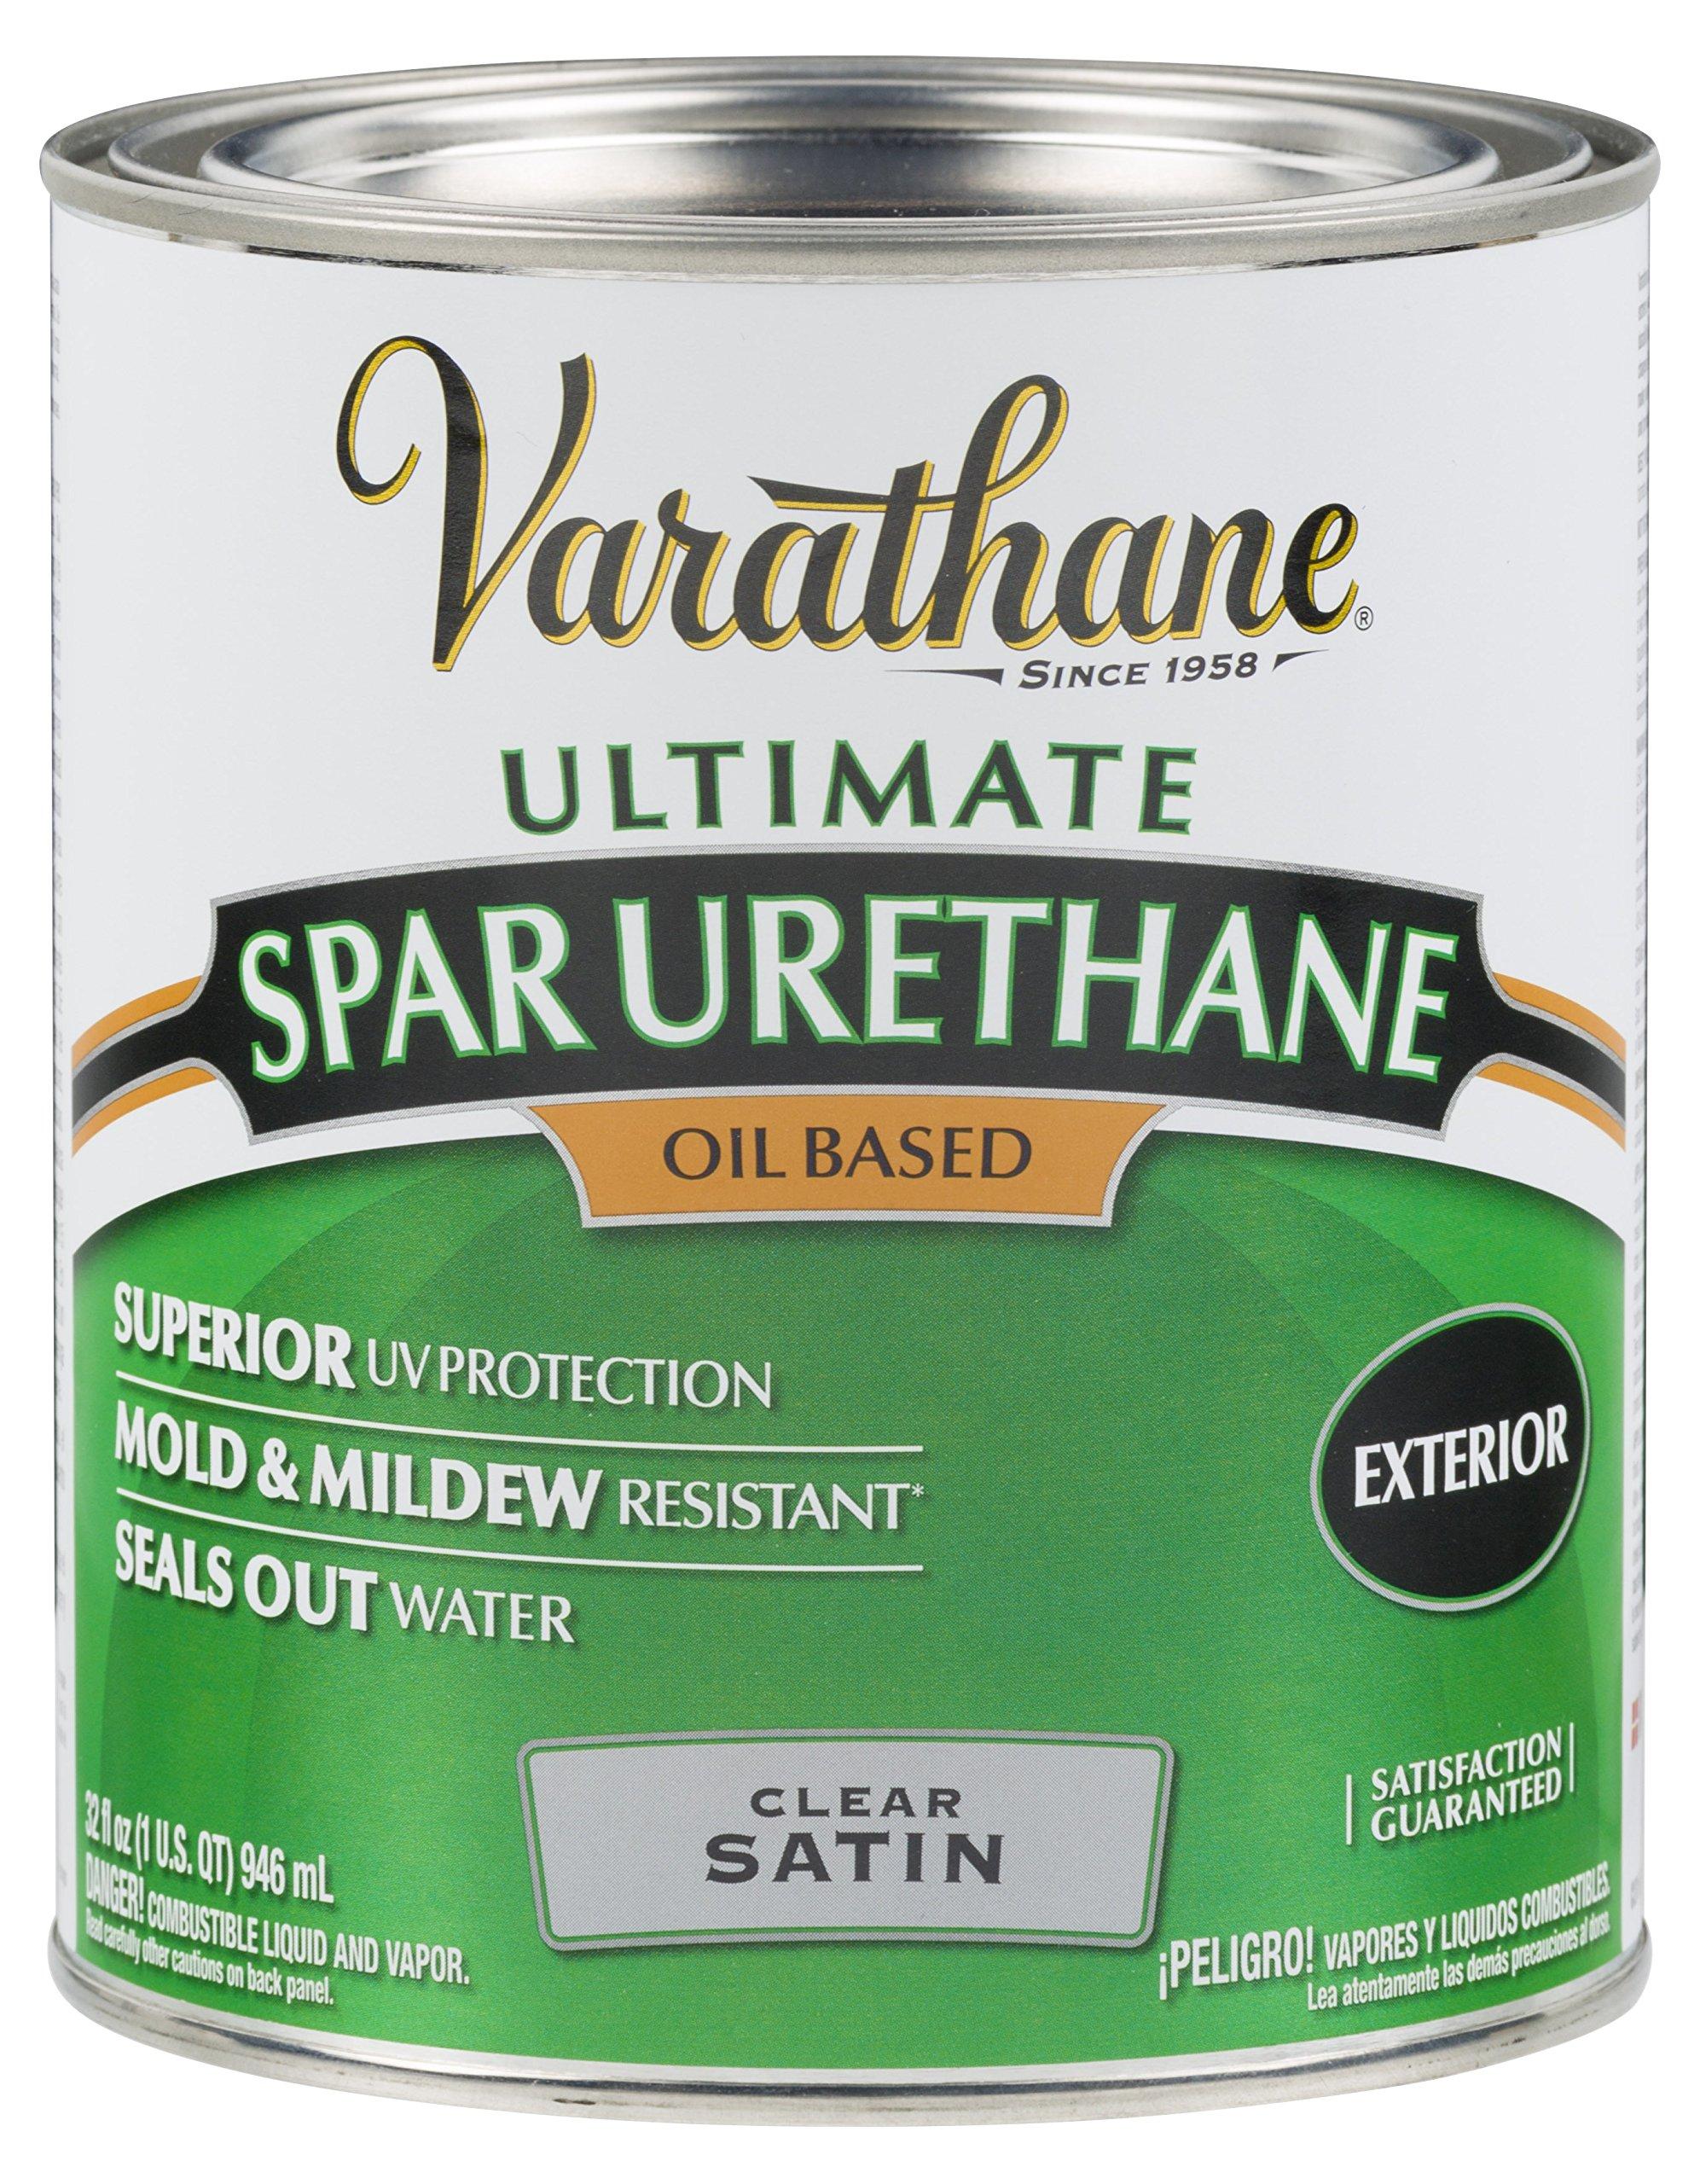 Rust-Oleum Varathane 9341H 1-Quart Classic Clear Oil Based Outdoor Spar Urethane, Satin Finish by Rust-Oleum